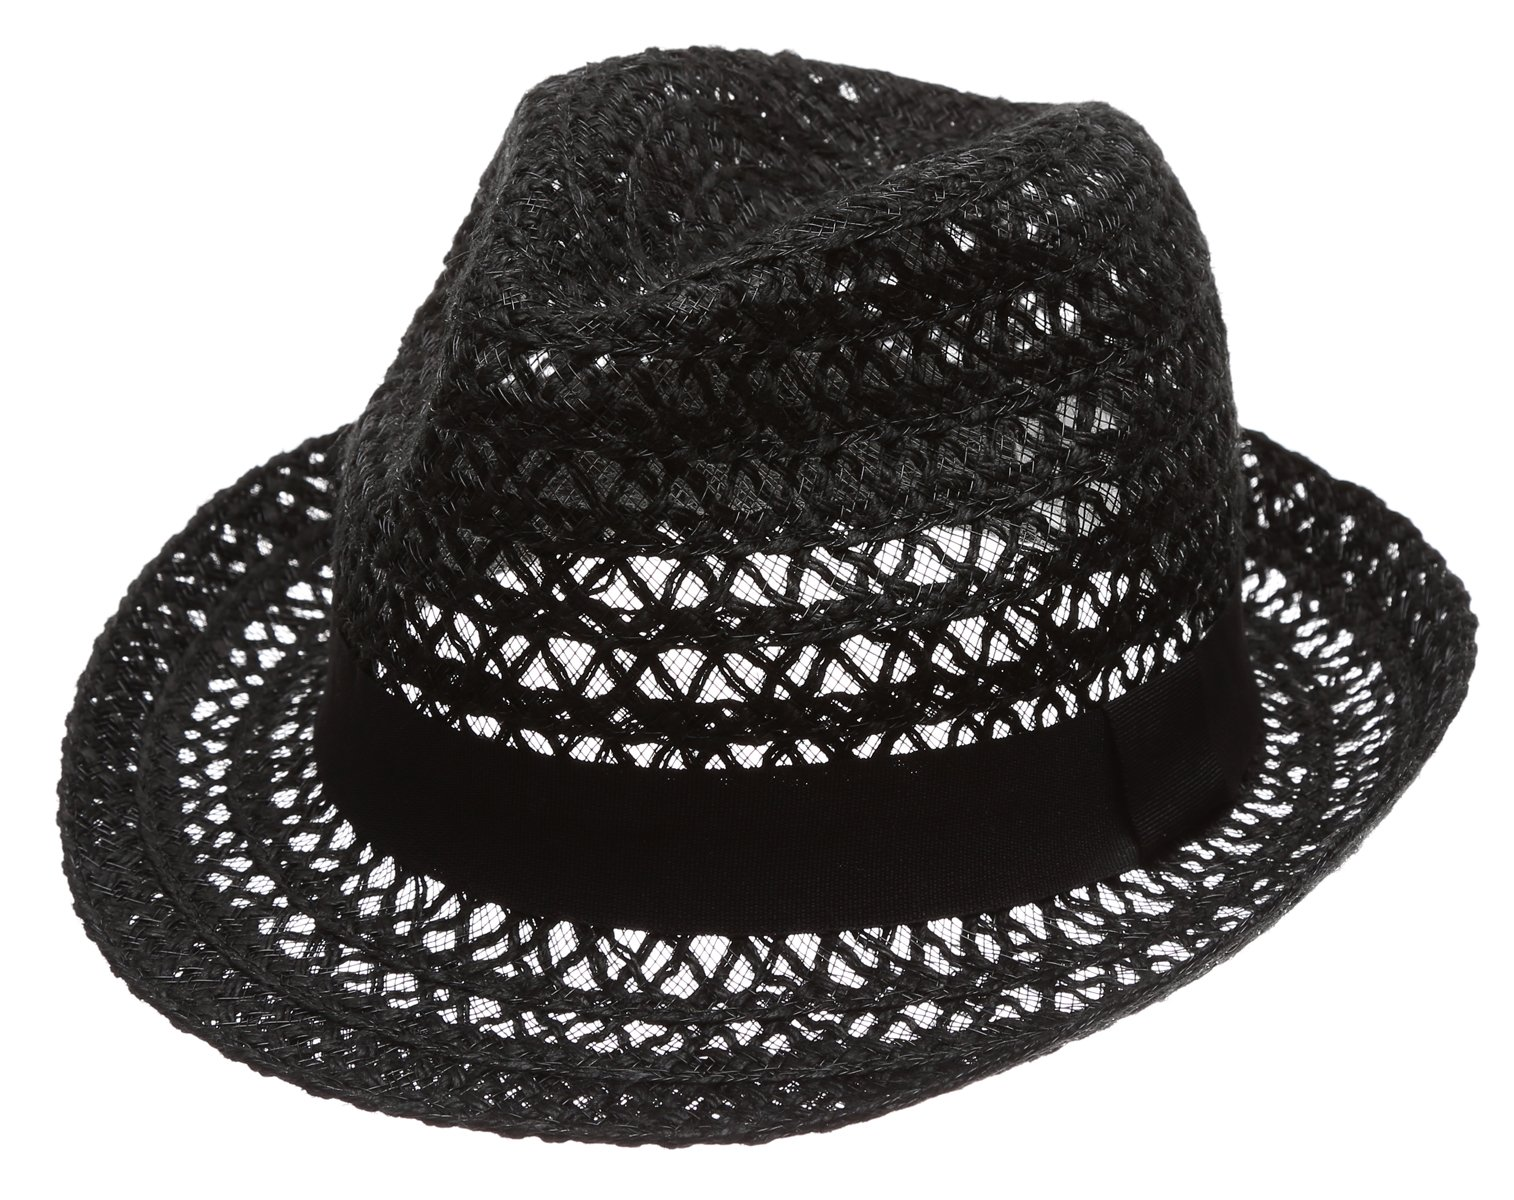 MIRMARU Summer Foldable Trilby Short Brim Lightweight 100% Linen Crushable Fedora Hat with Band(Black)